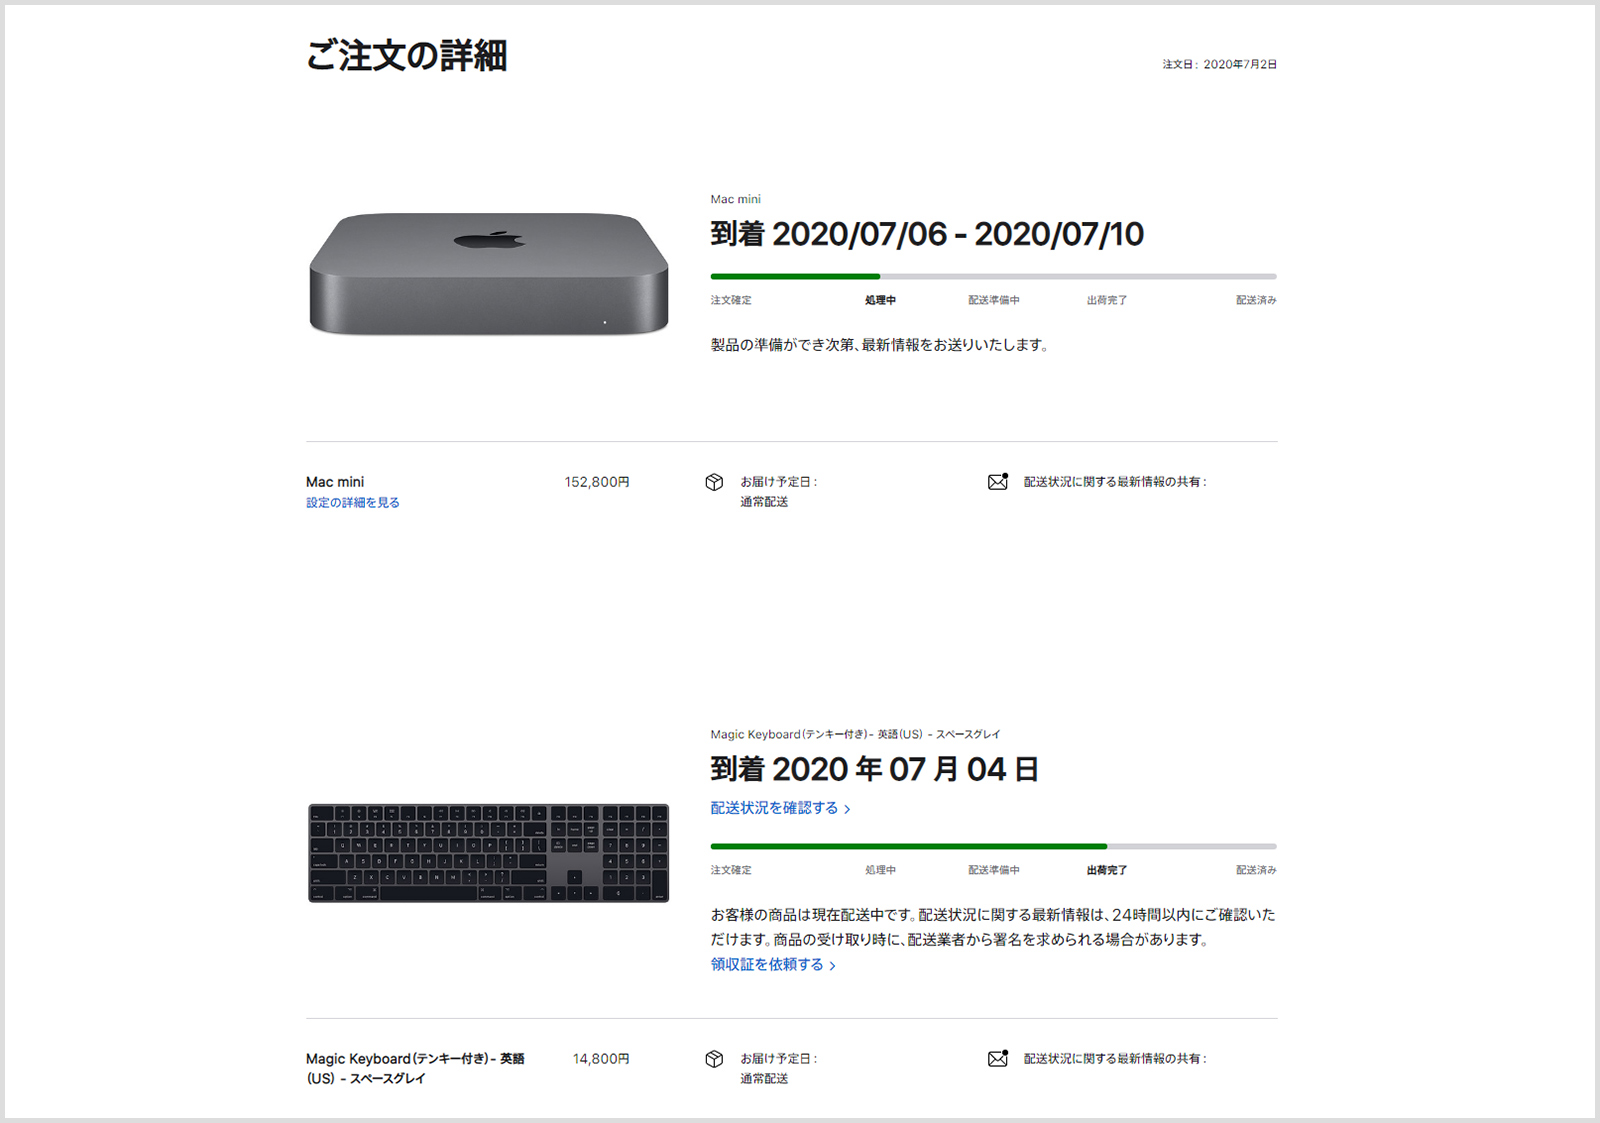 Mac mini 2020 注文しました。